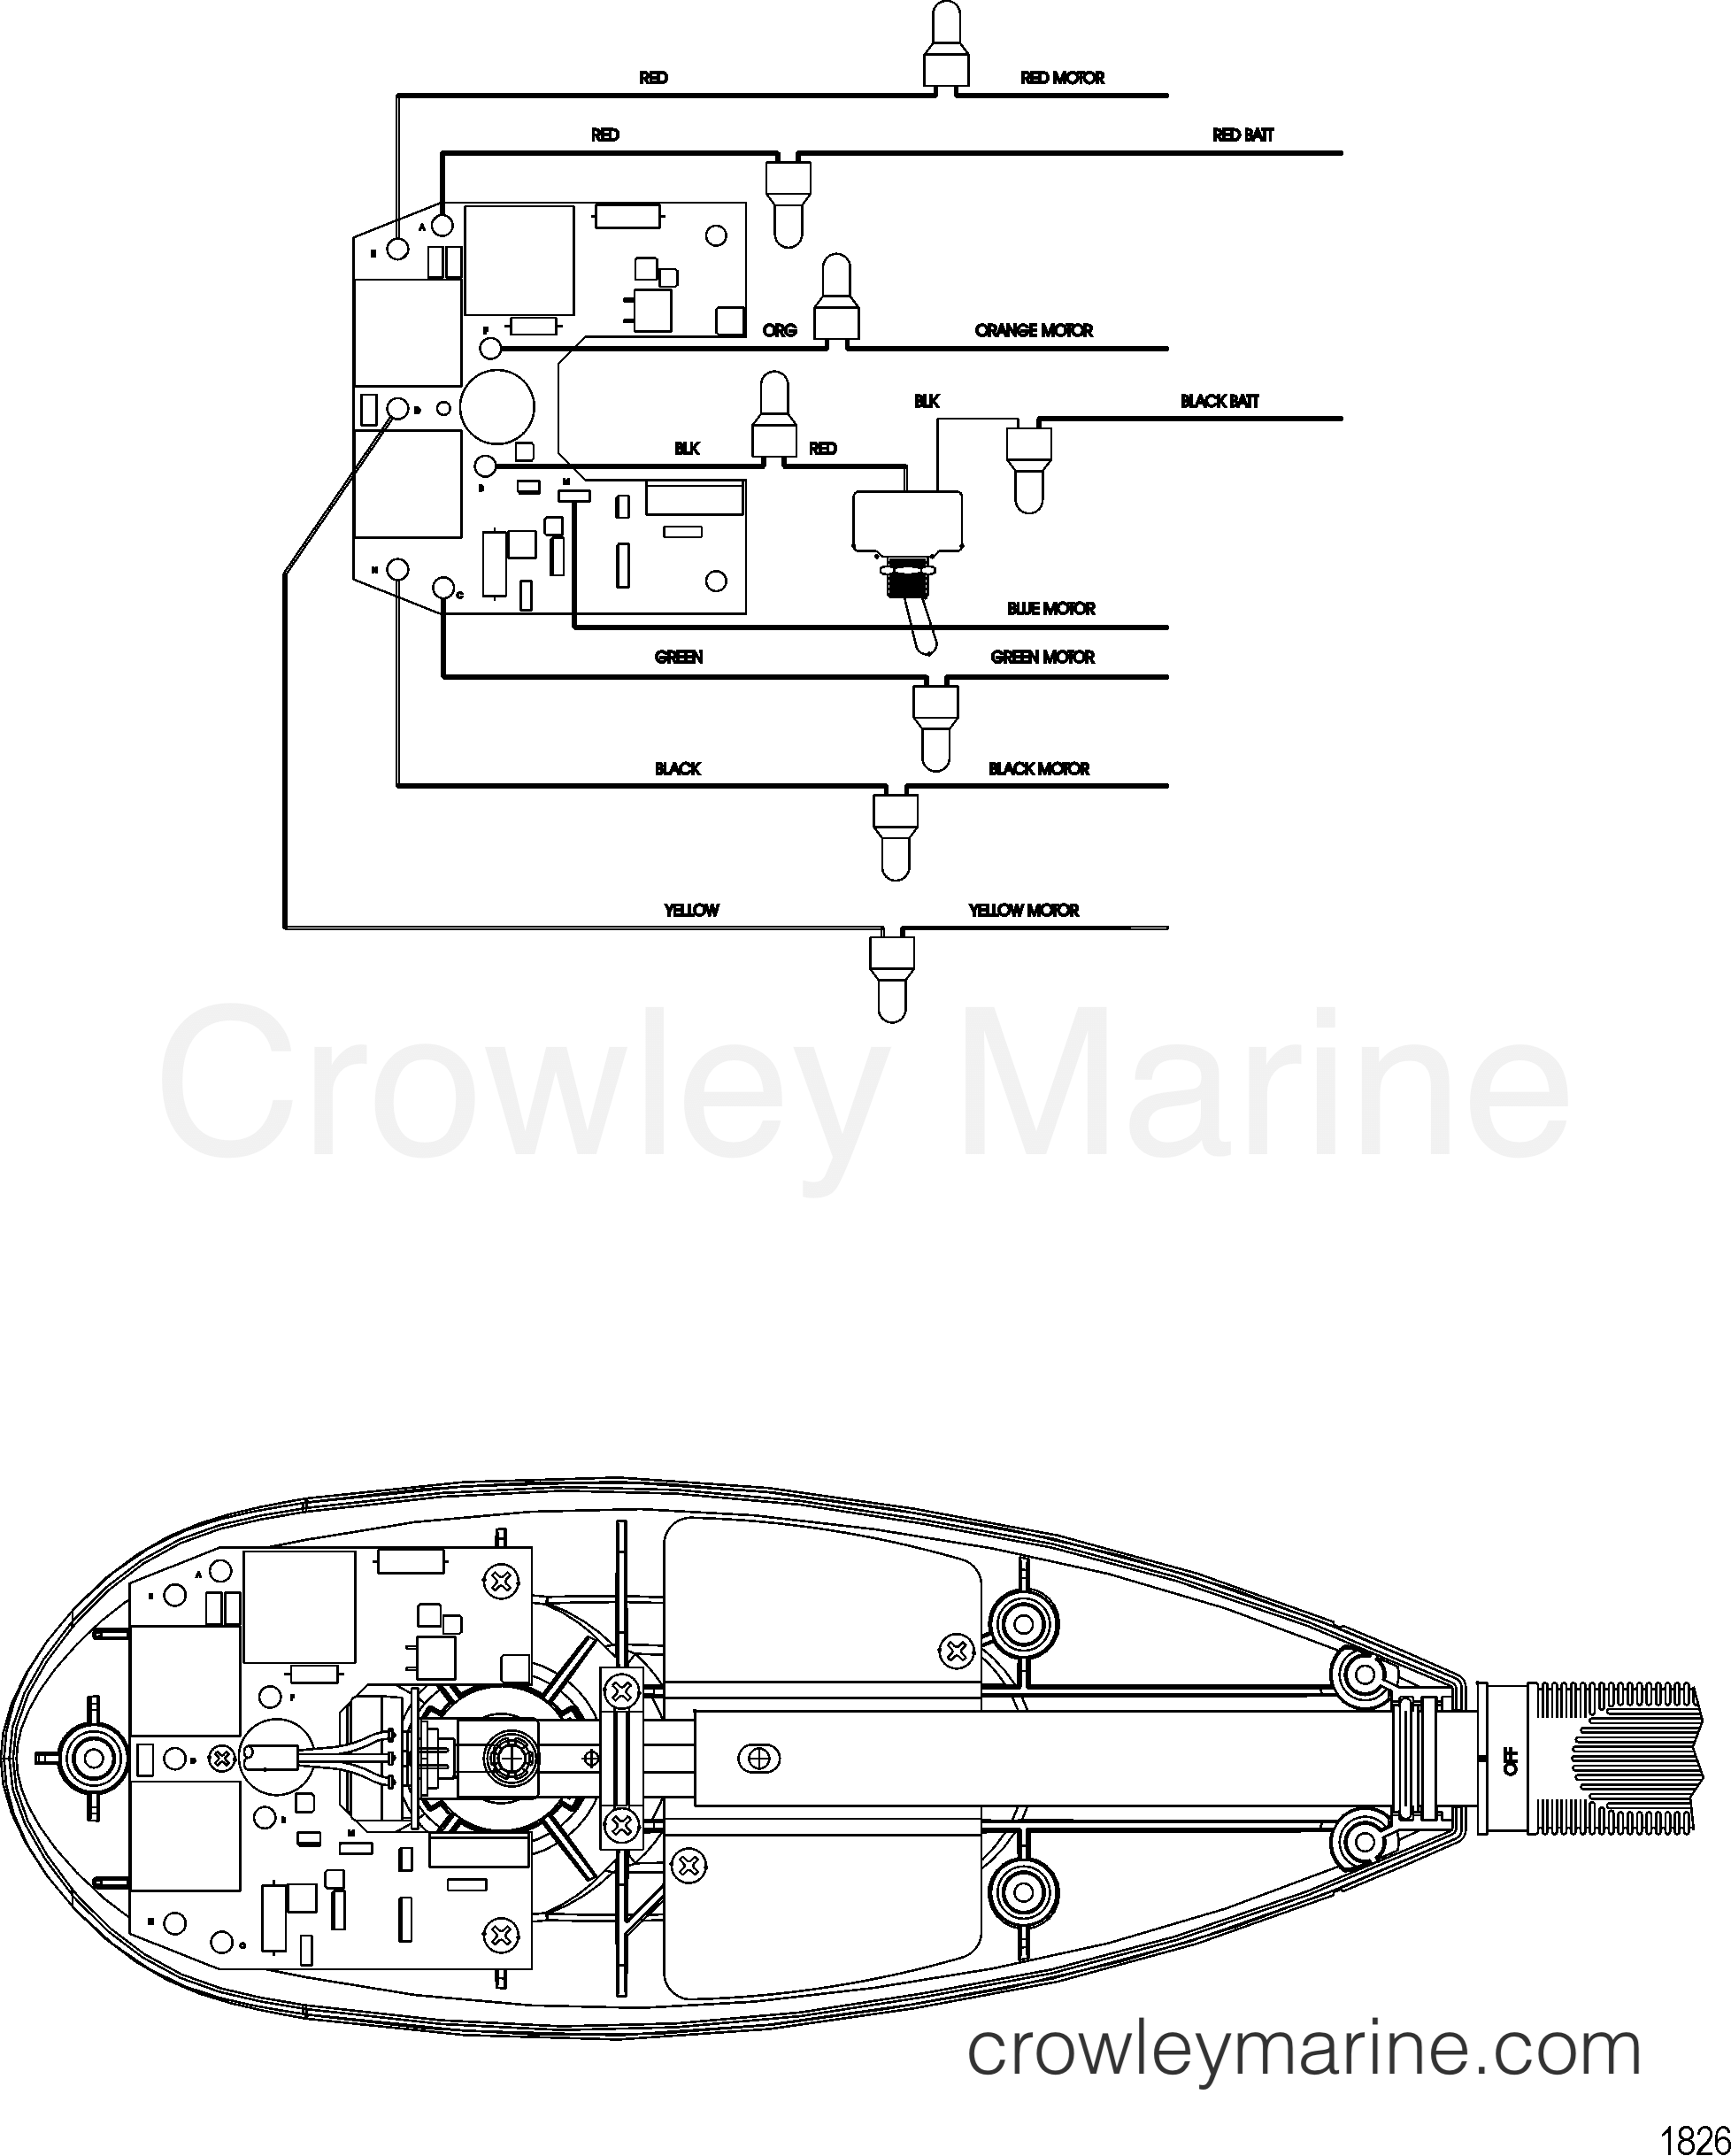 2004 MotorGuide 24V [MOTORGUIDE] - 9BU42FACF WIRE DIAGRAM(MODEL FW82HBV) section